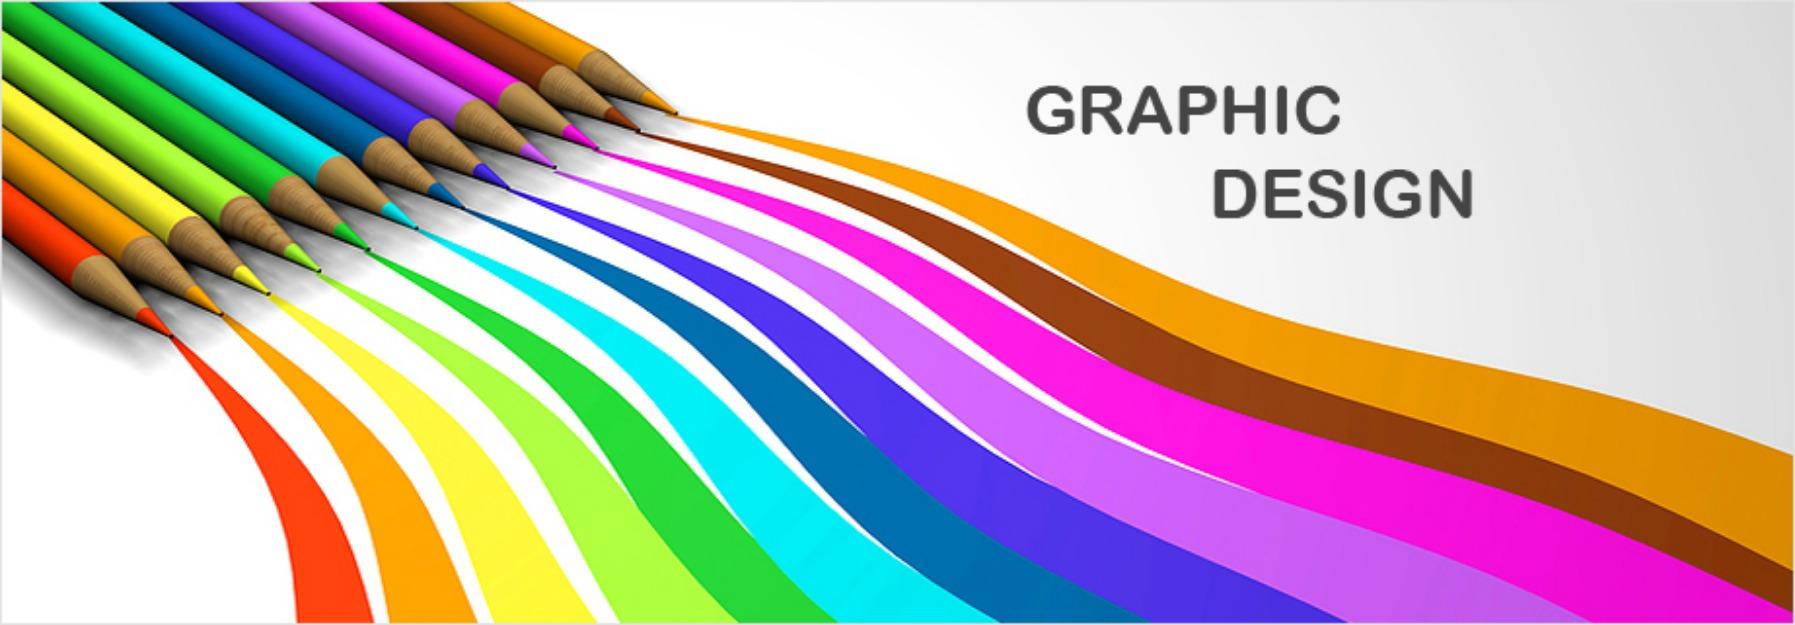 طراحی سایت کانون تبلیغاتی گرافیکی